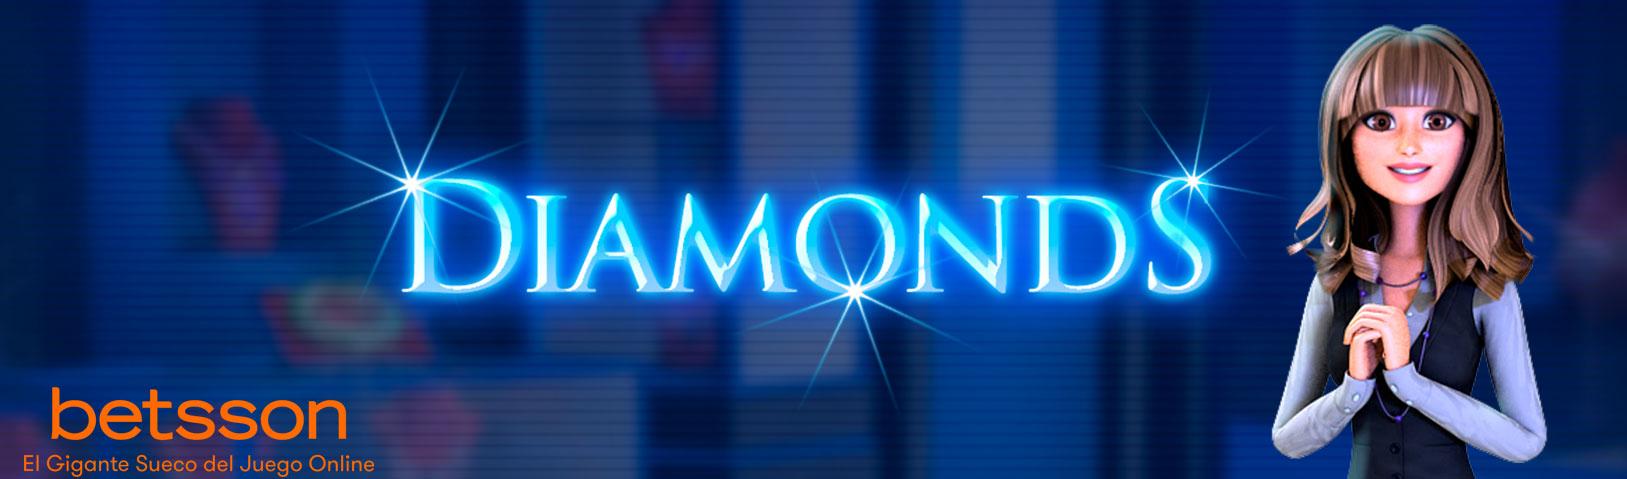 DIAMONDS BINGO, canta bingo y llévate hasta 30.000 euros